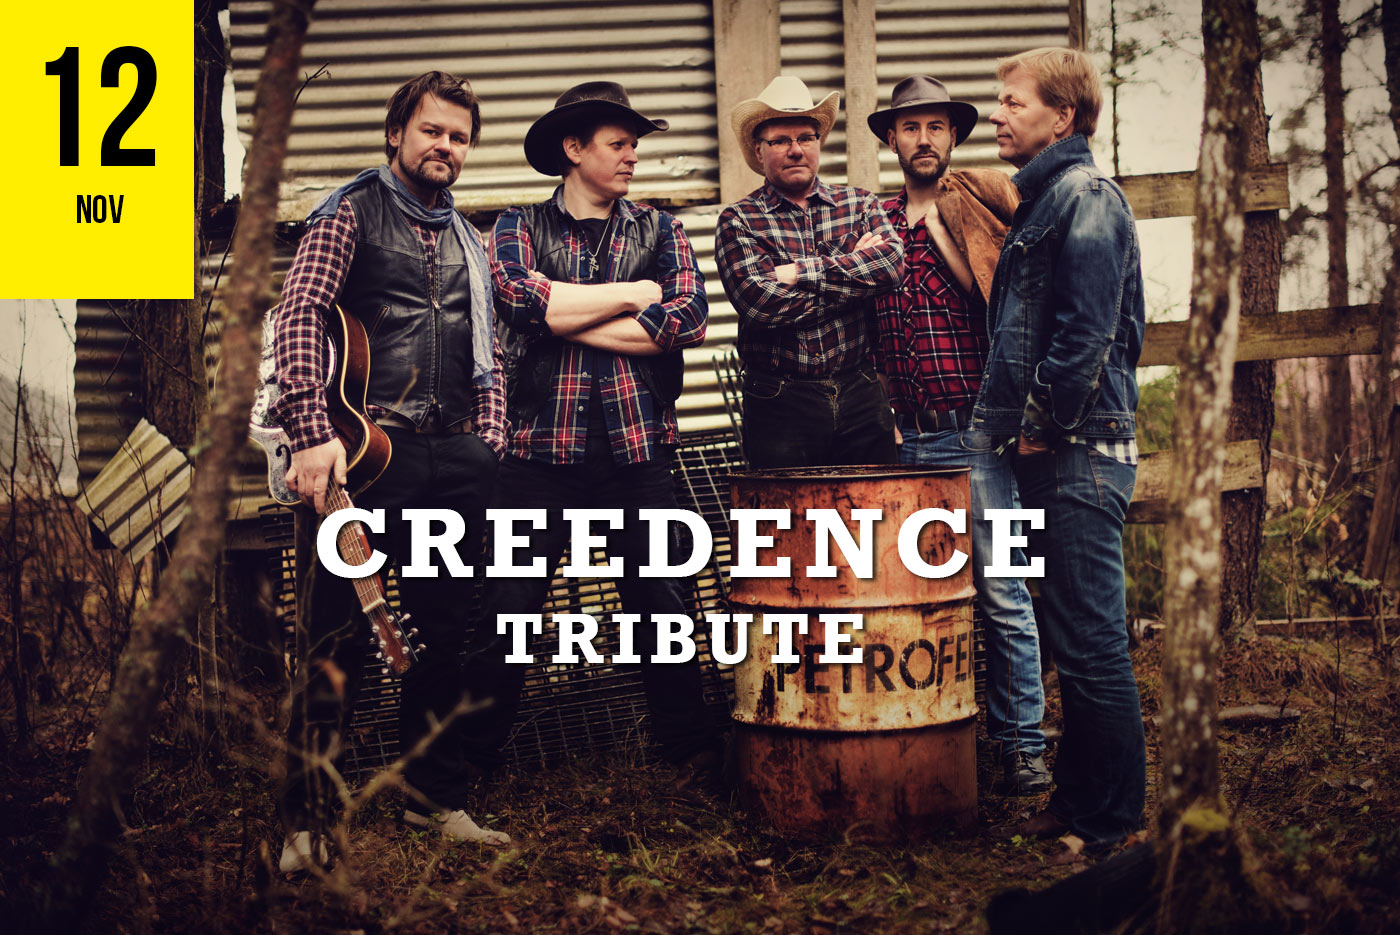 12-nov-creedence